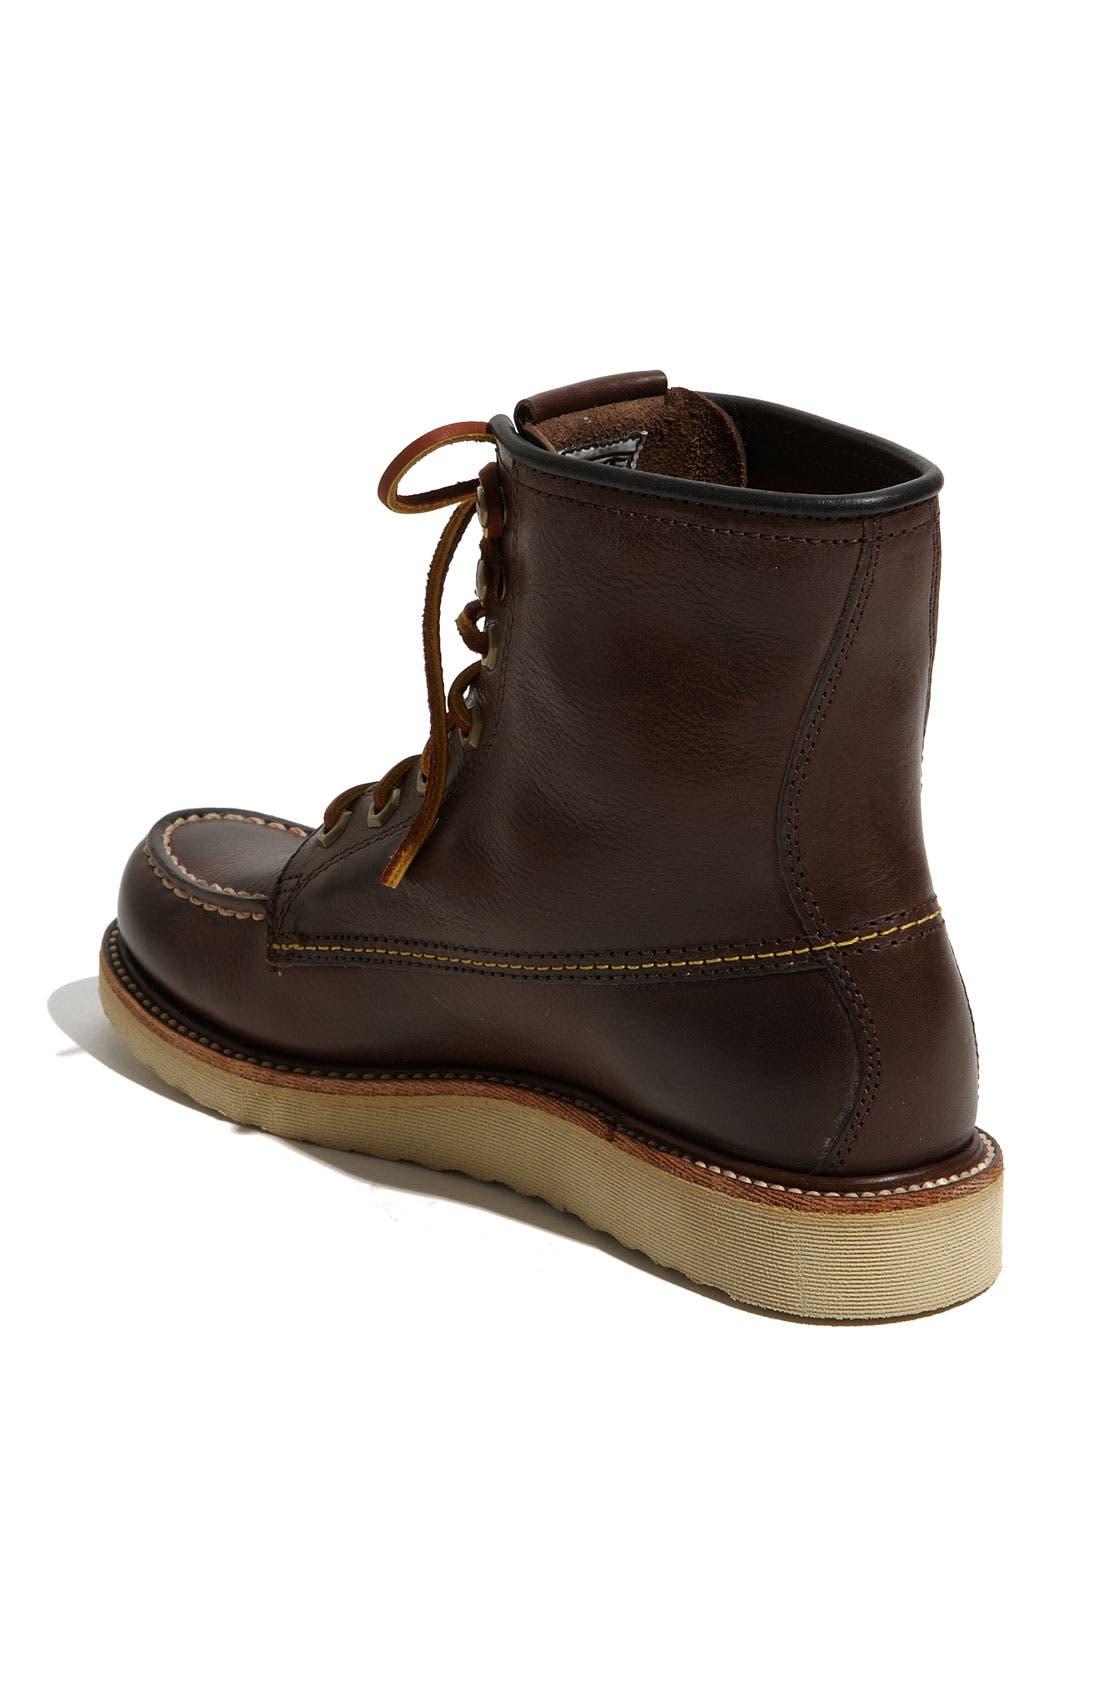 Alternate Image 2  - Frye 'Dakota' Wedge Boot